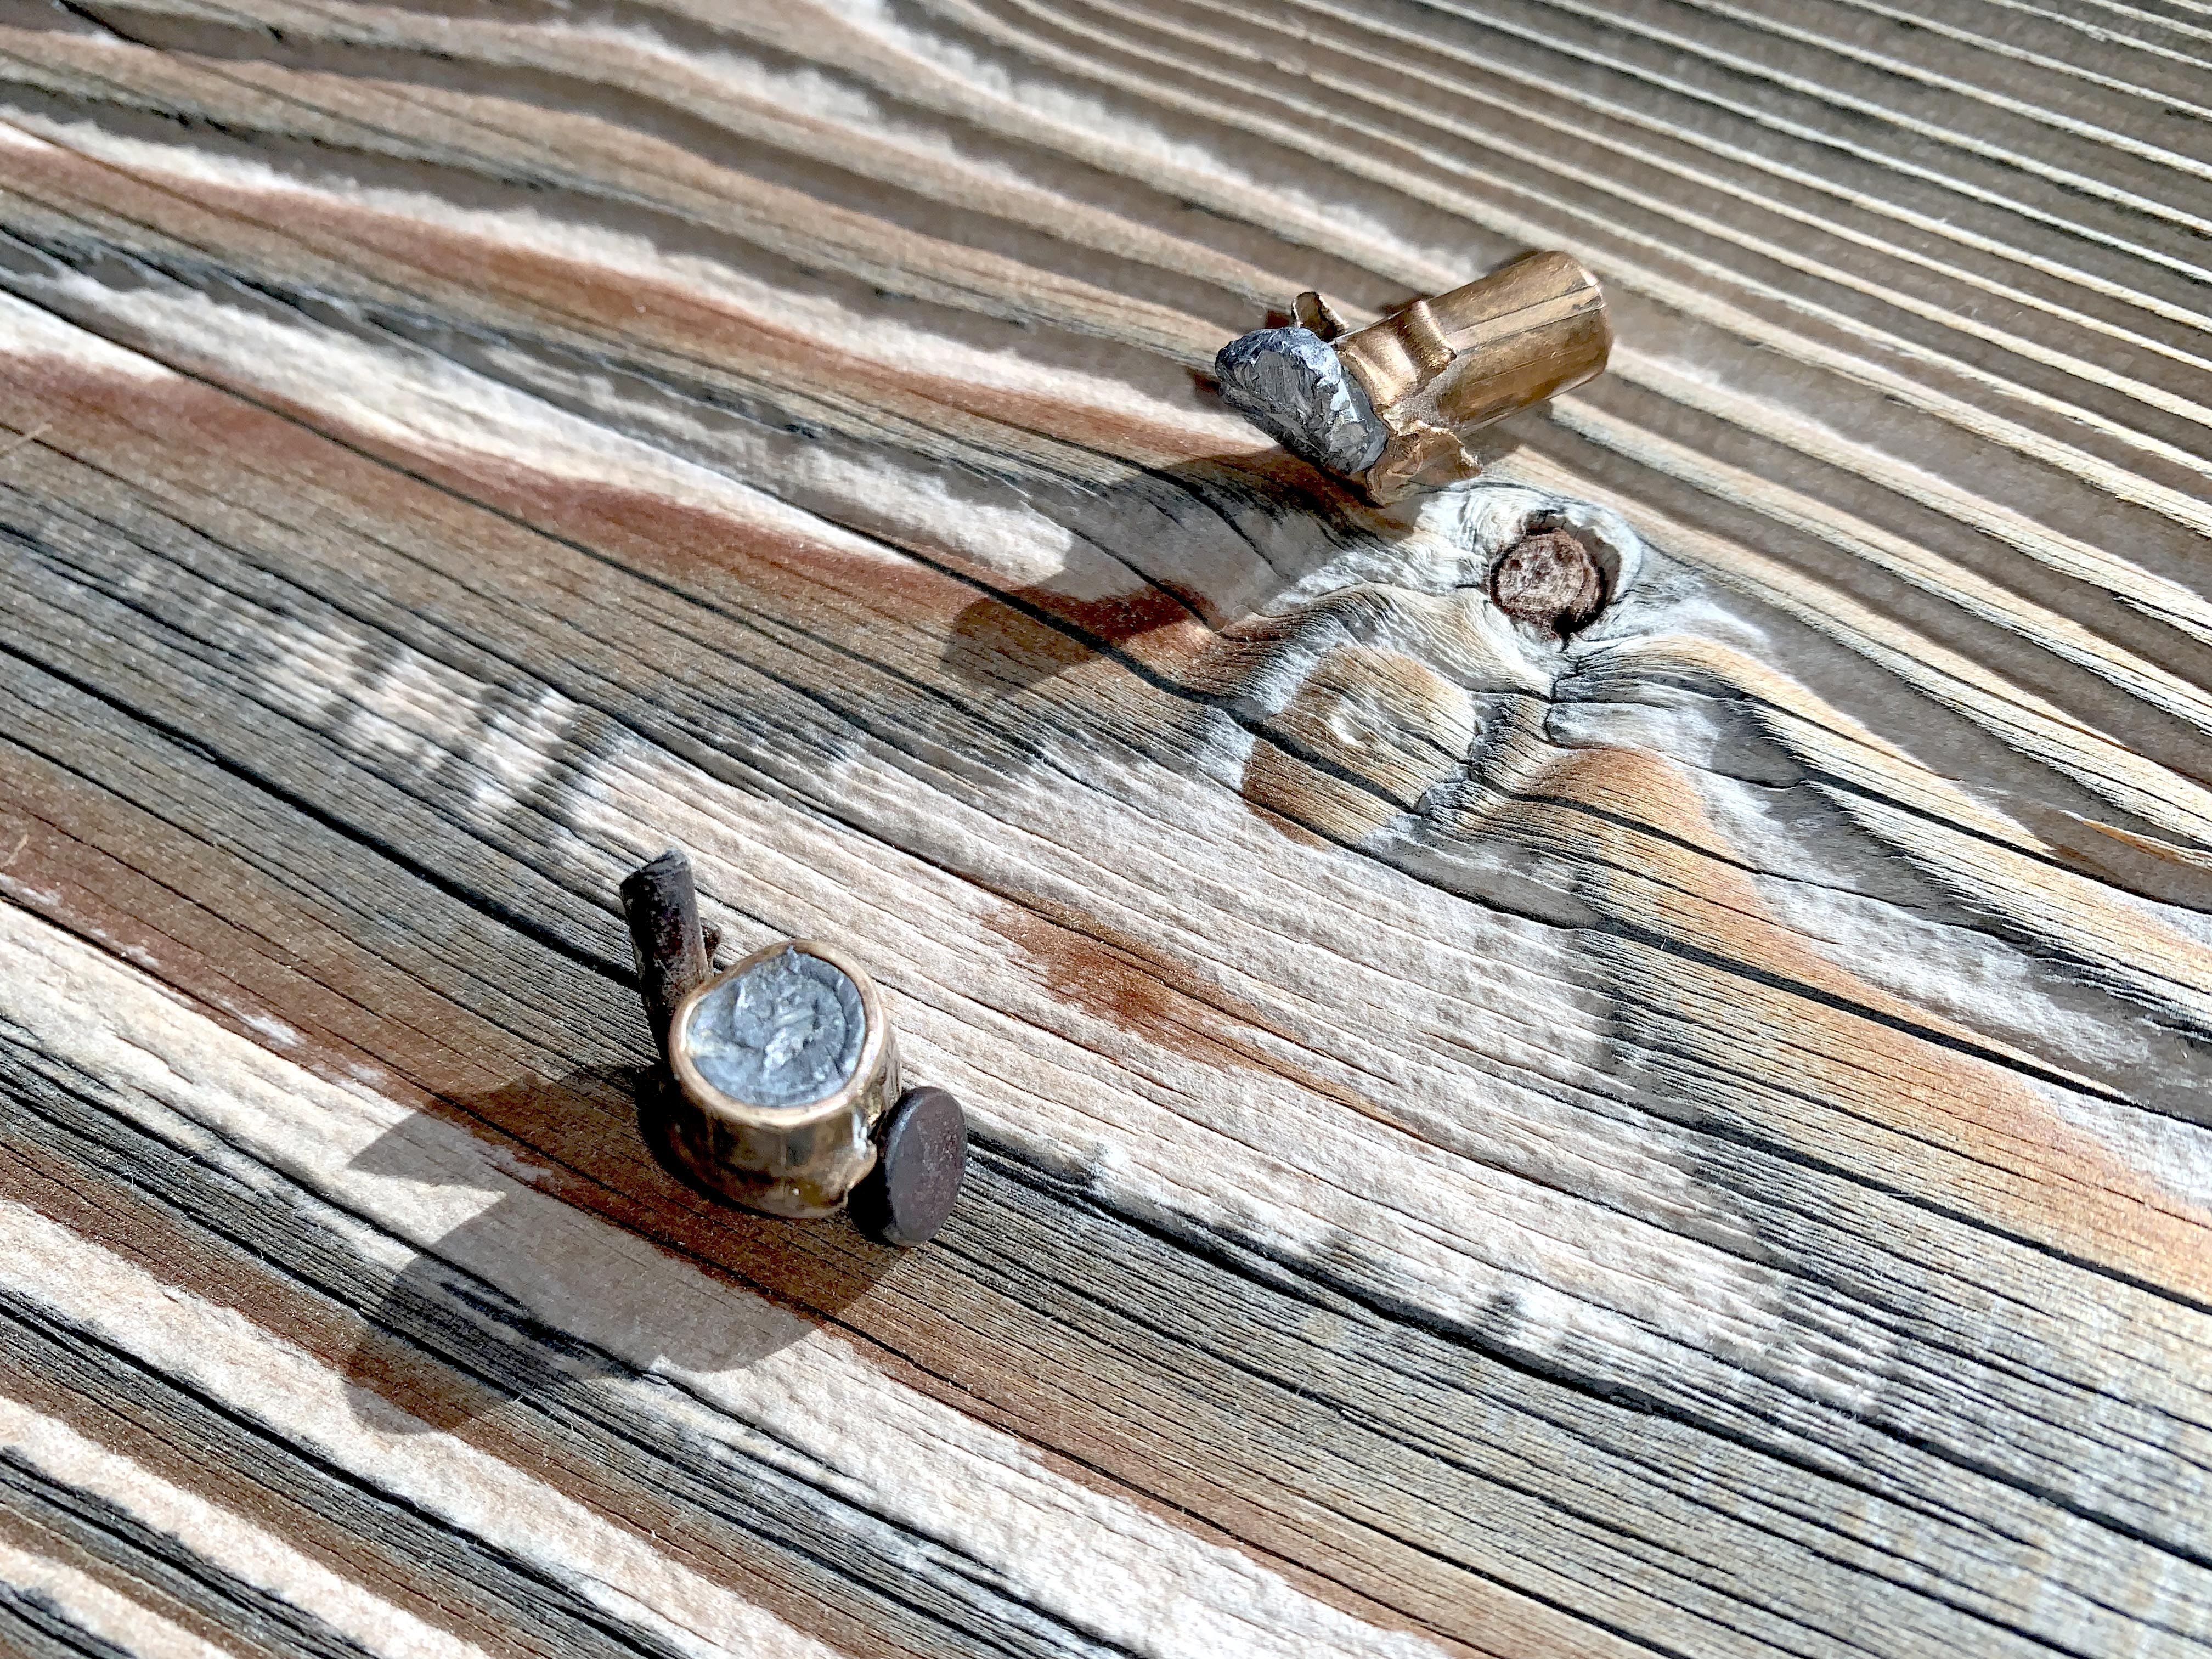 Tough Reclaimed Wood Reclaimed Wood Siding Reclaimed Wood Aging Wood